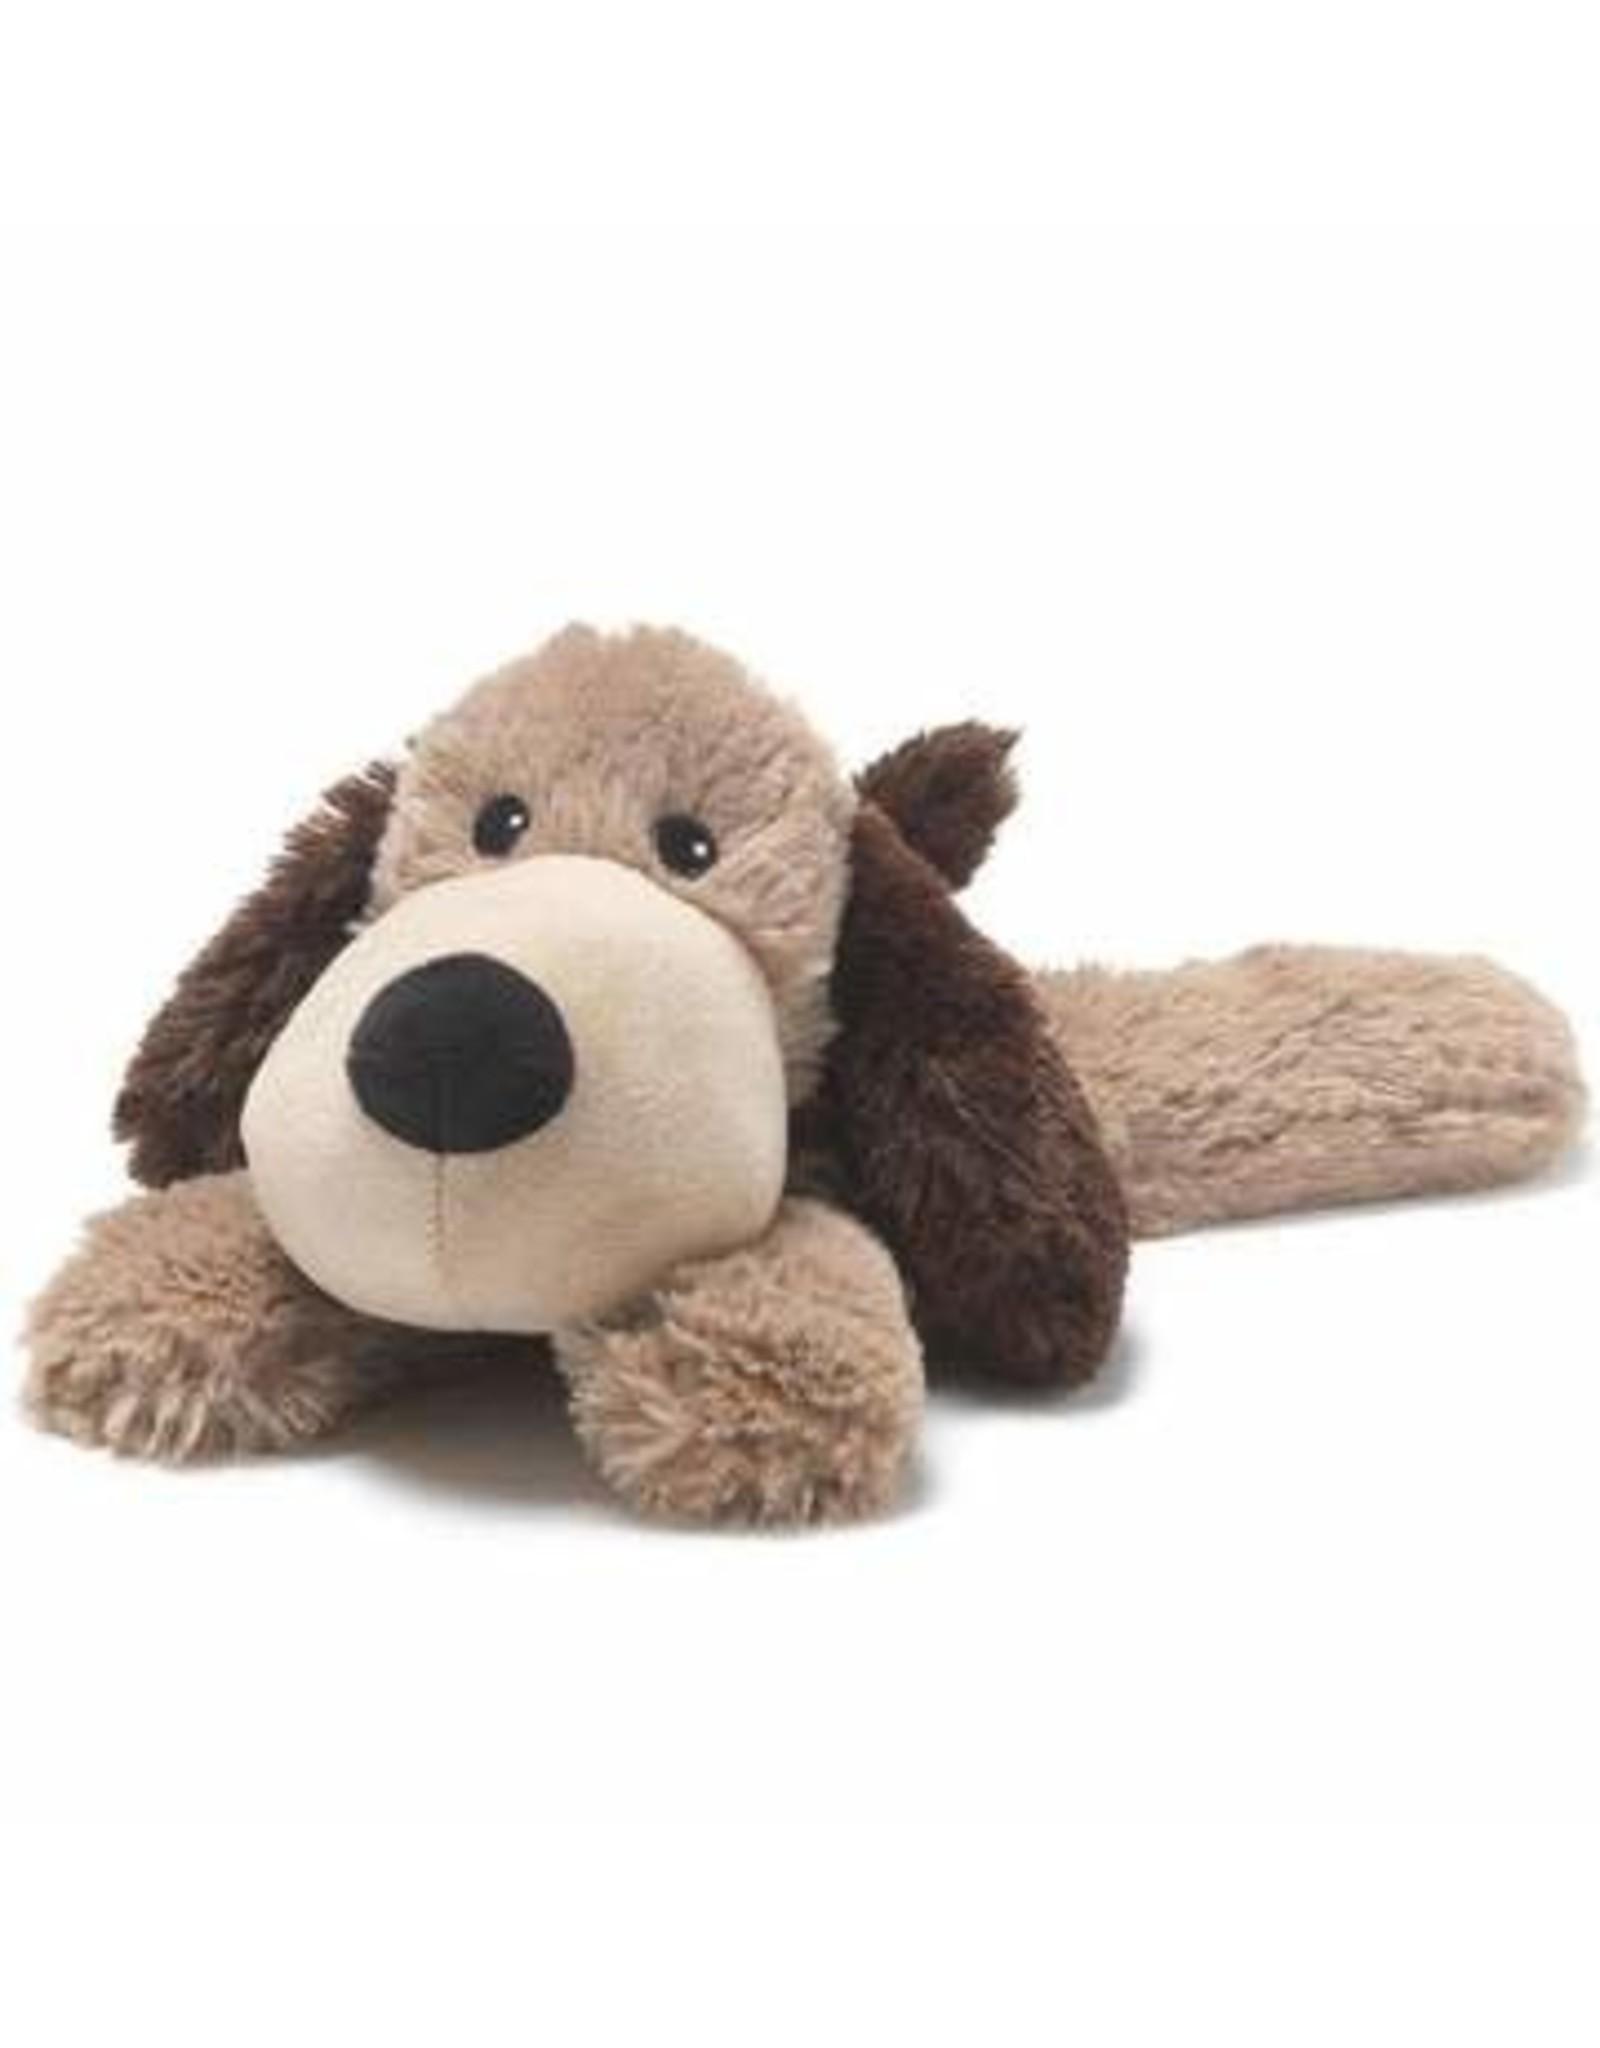 Intelex USA / Warmies BROWN DOG LAYING DOWN  WARMIE